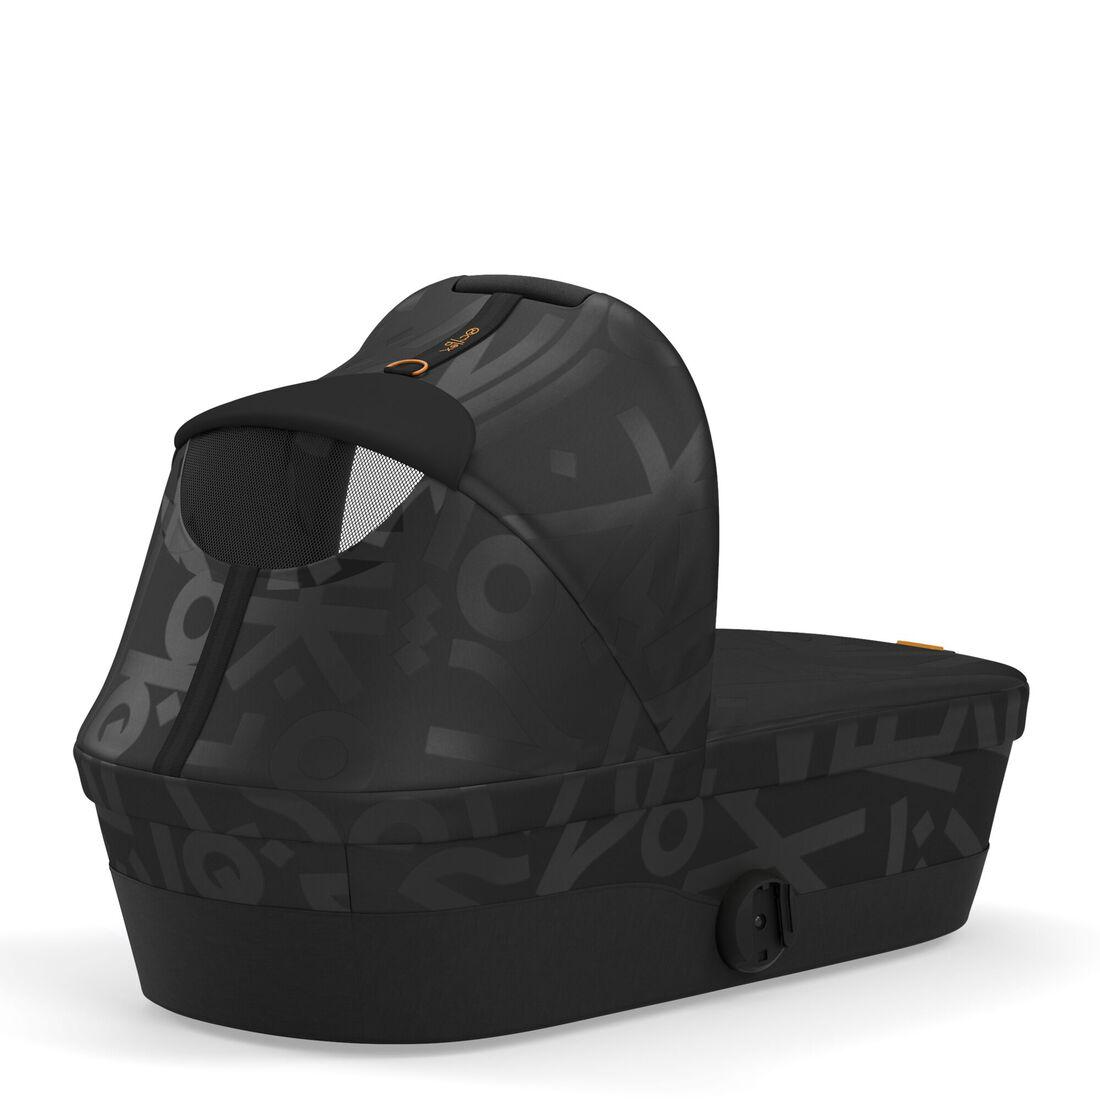 CYBEX Melio Cot - Real Black in Real Black large Bild 5